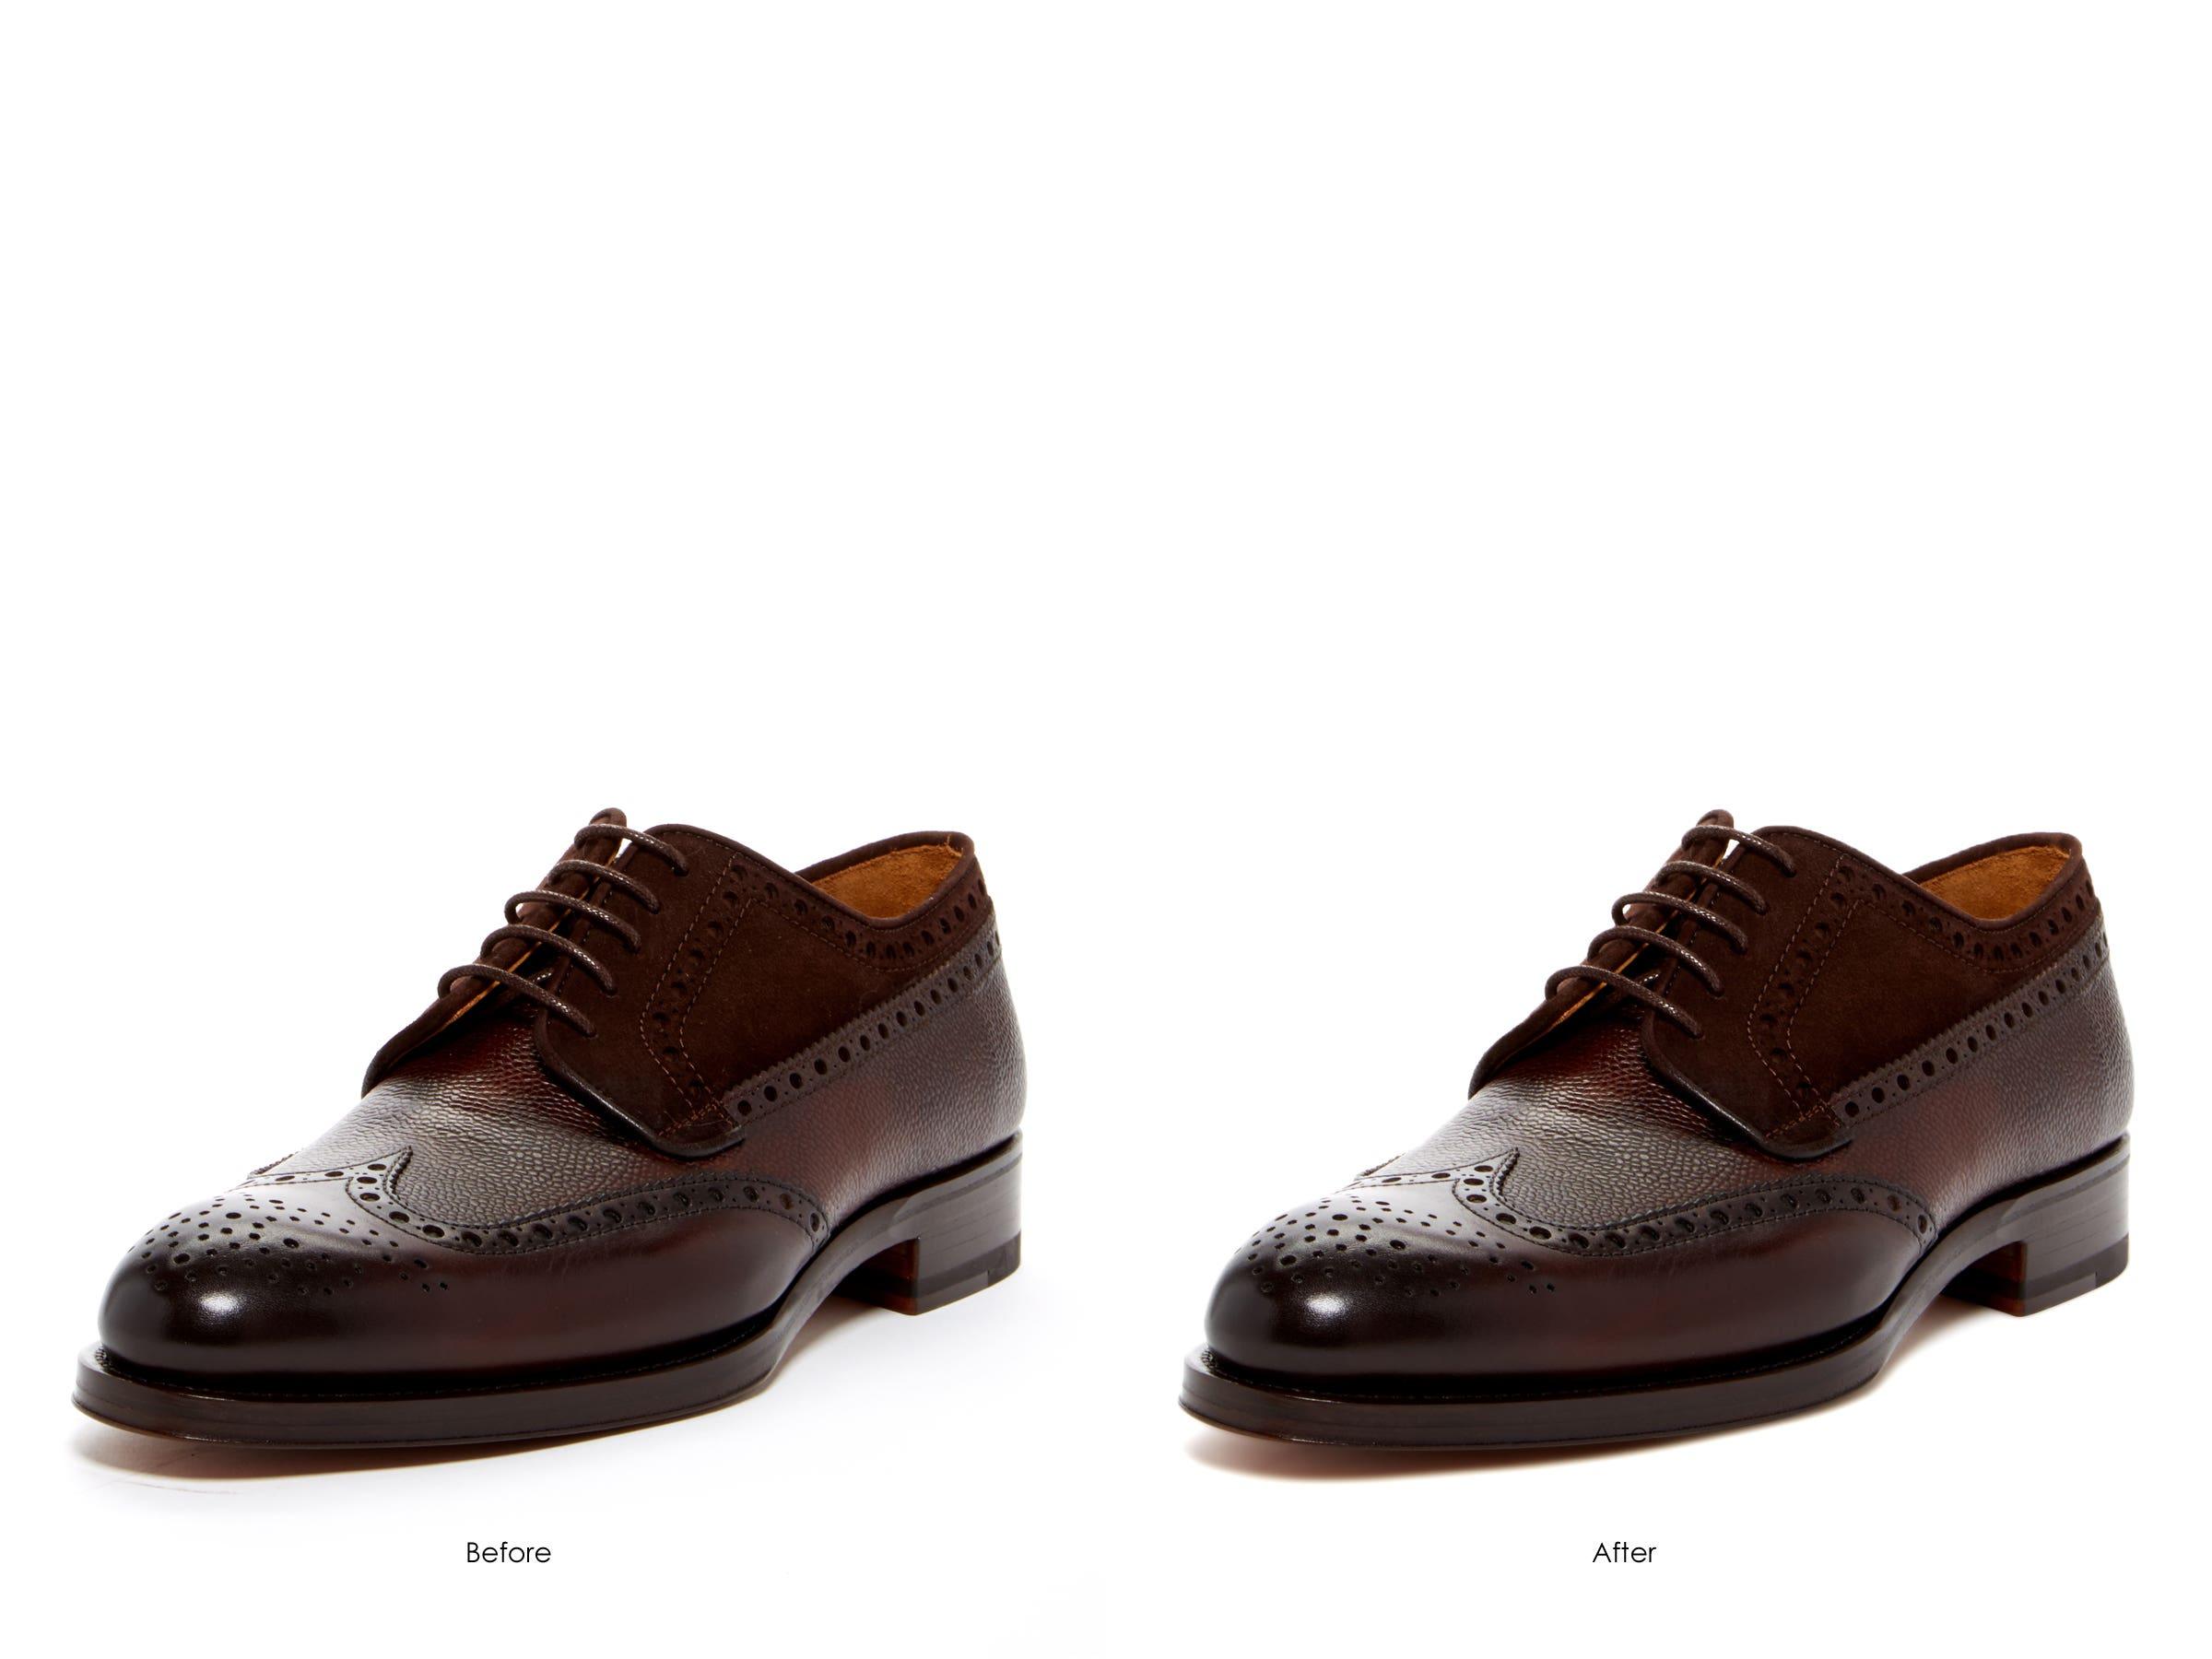 Shoes I edidited